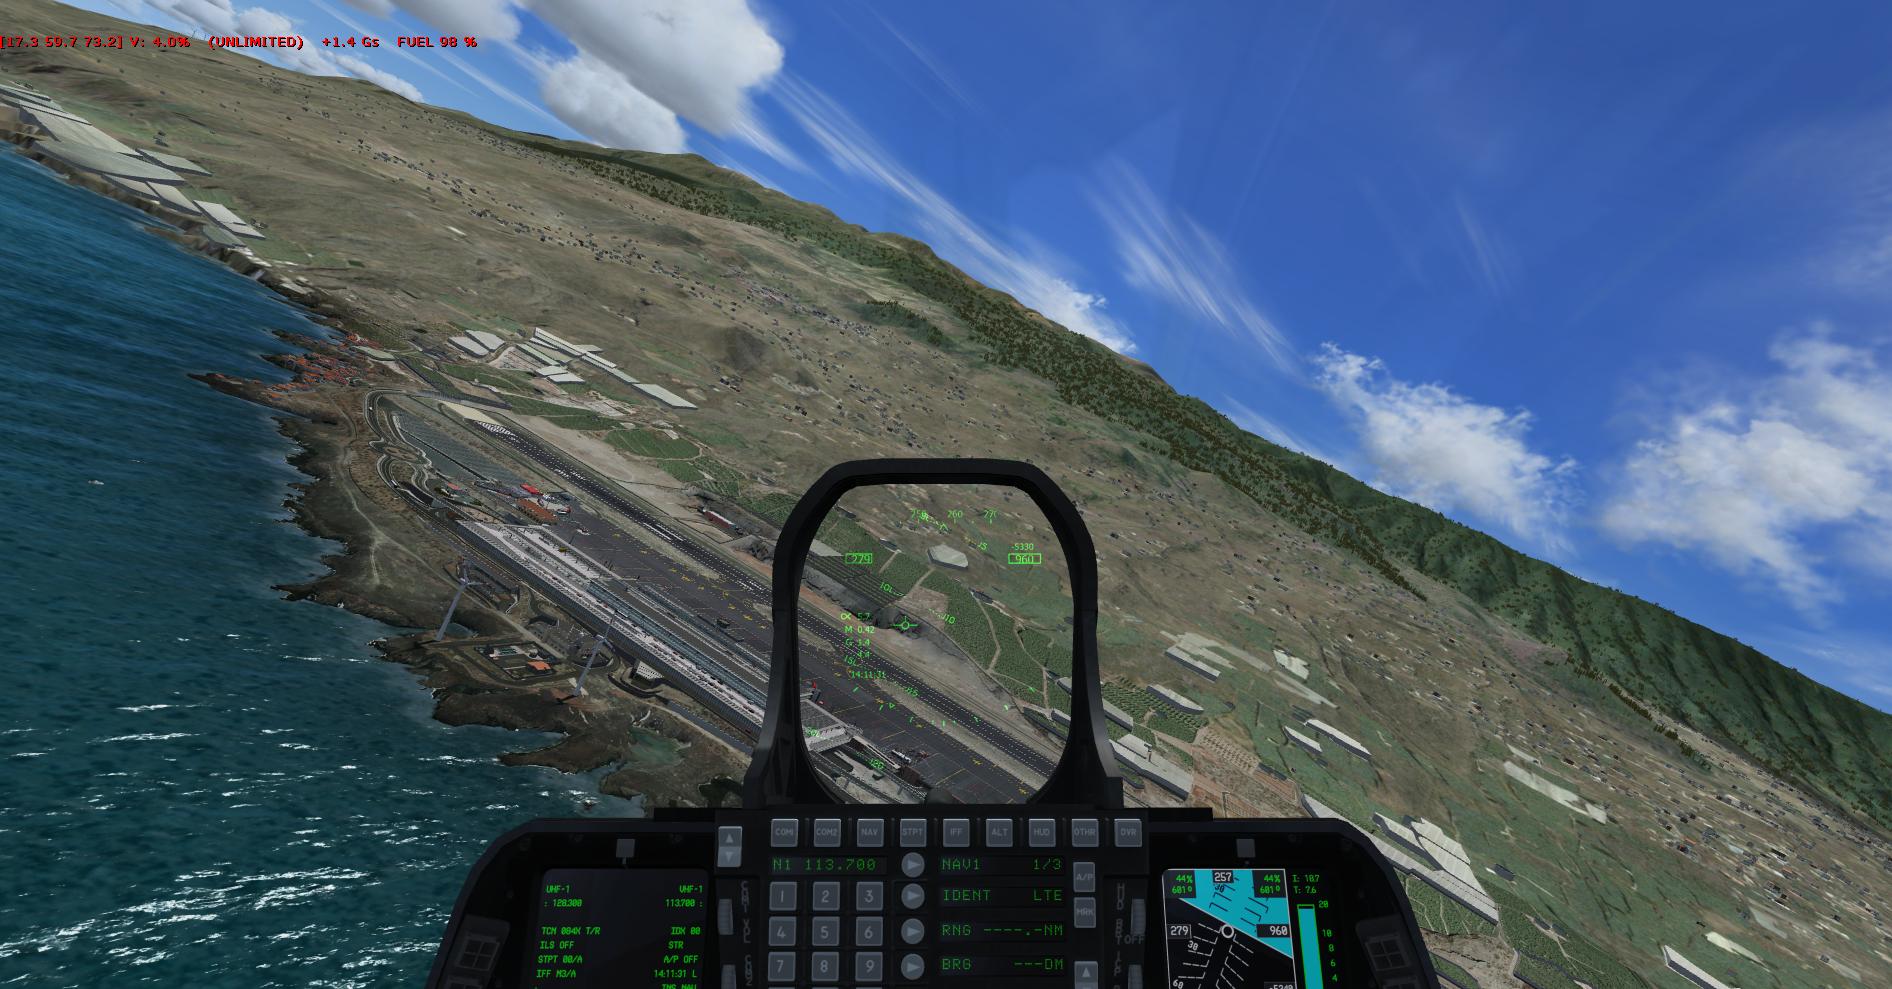 La Palma Flickering Textures FSX - Aerosoft Scenery - AEROSOFT